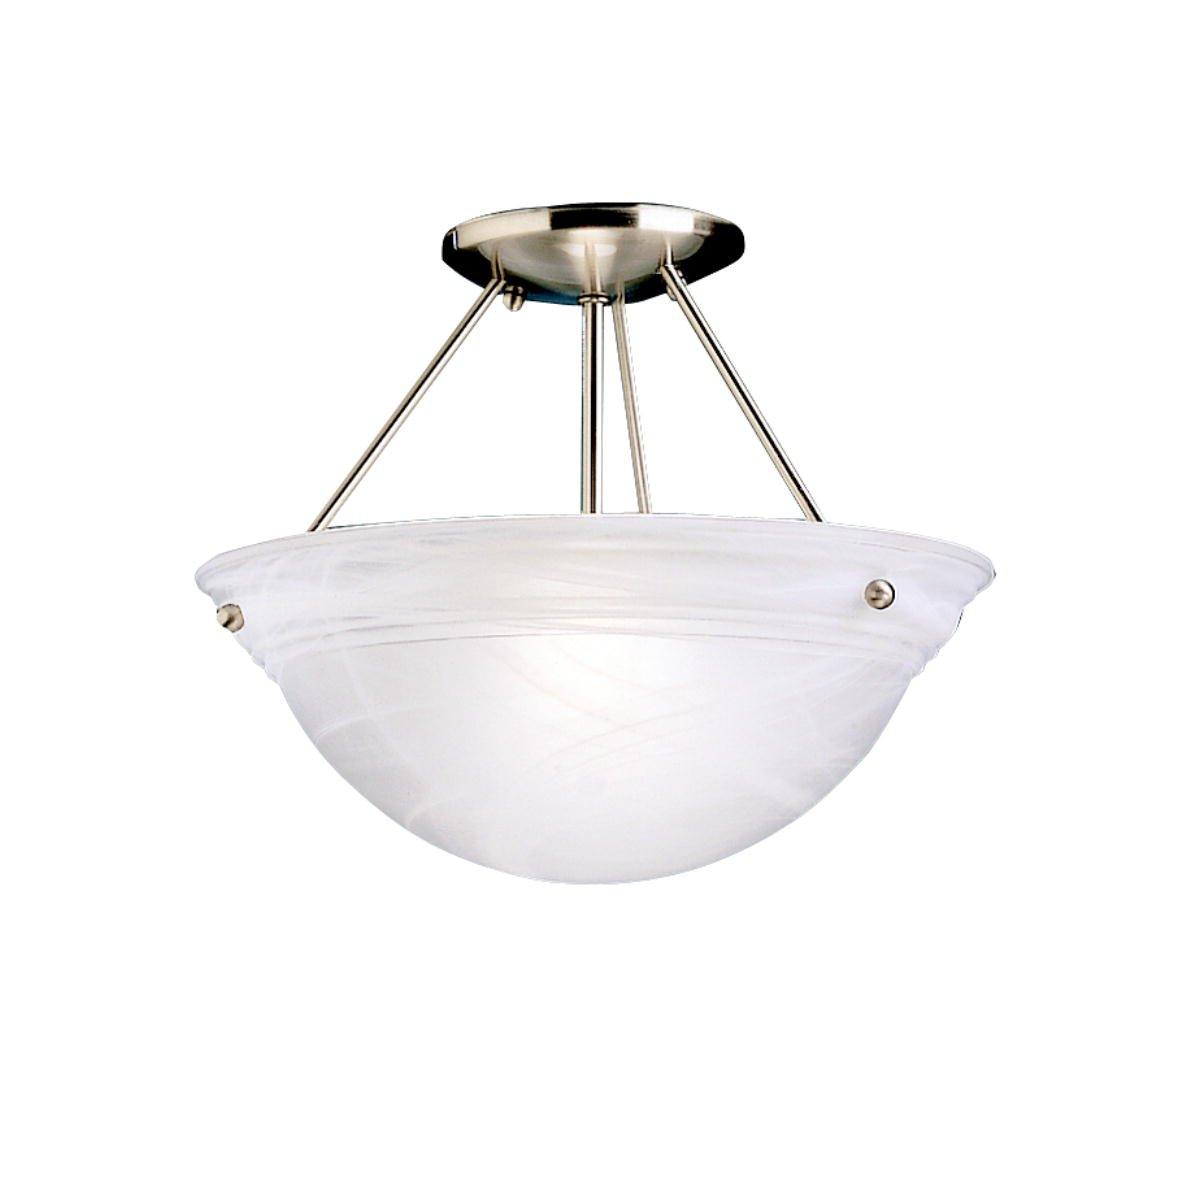 kichler 3122ni cove molding 3light semi flush brushed nickel semi flush mount ceiling light fixtures amazoncom